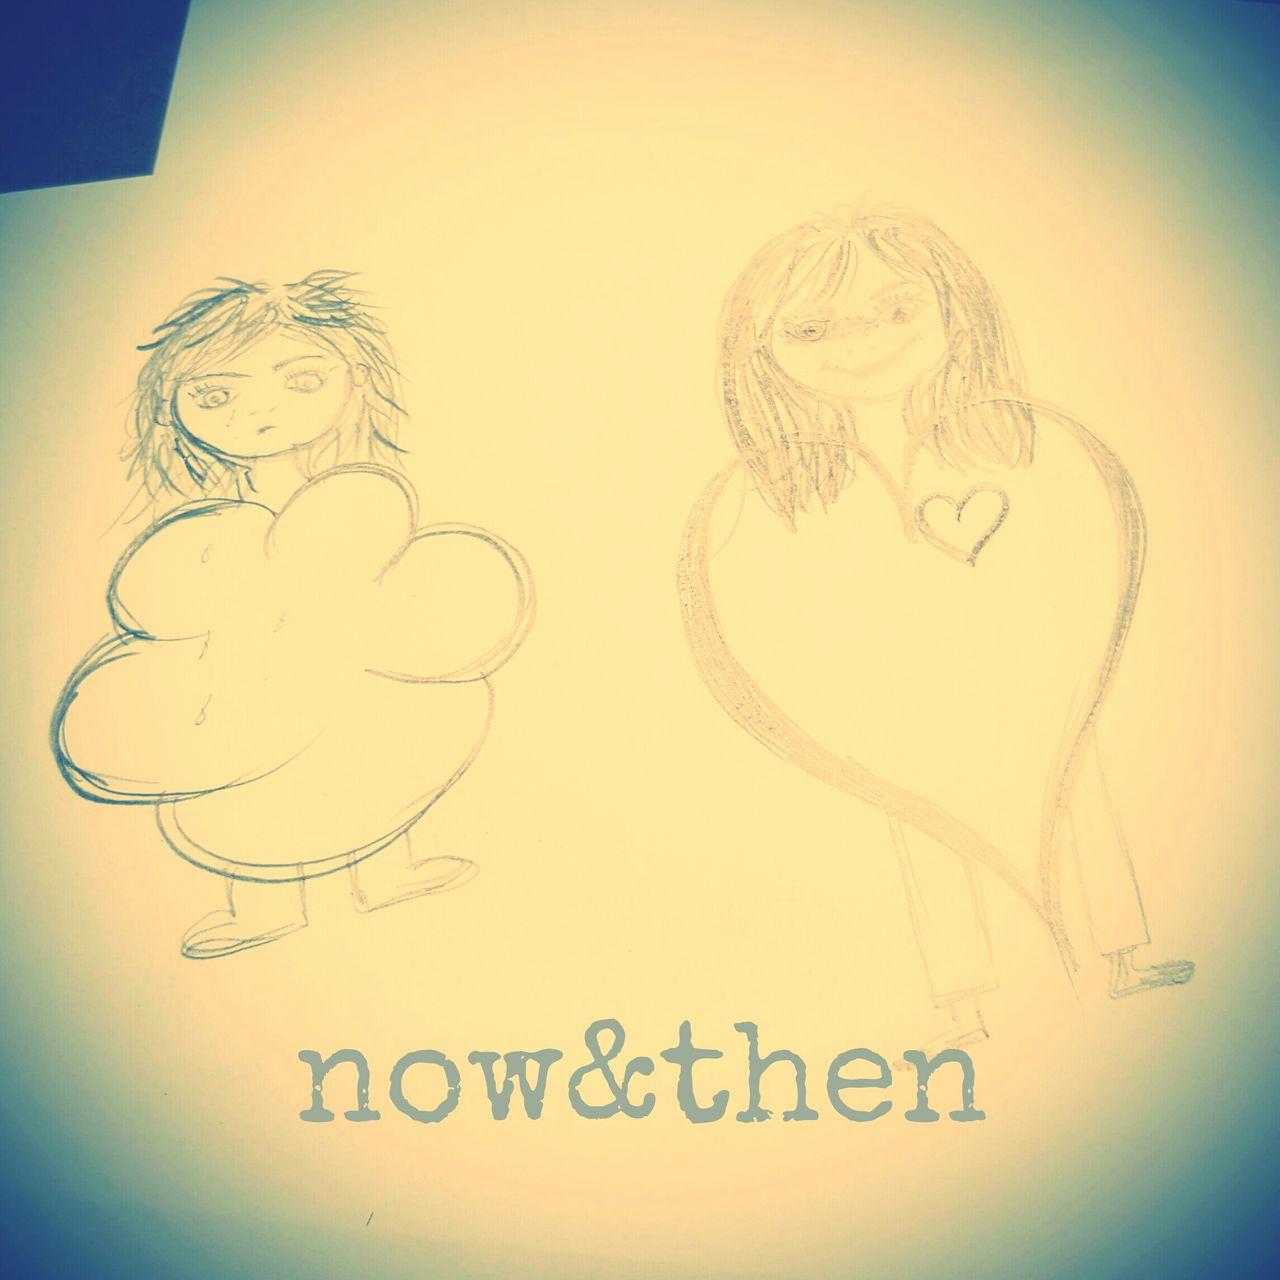 Nowandthen Heartbeat Moments Drawing - Art Product Drawing